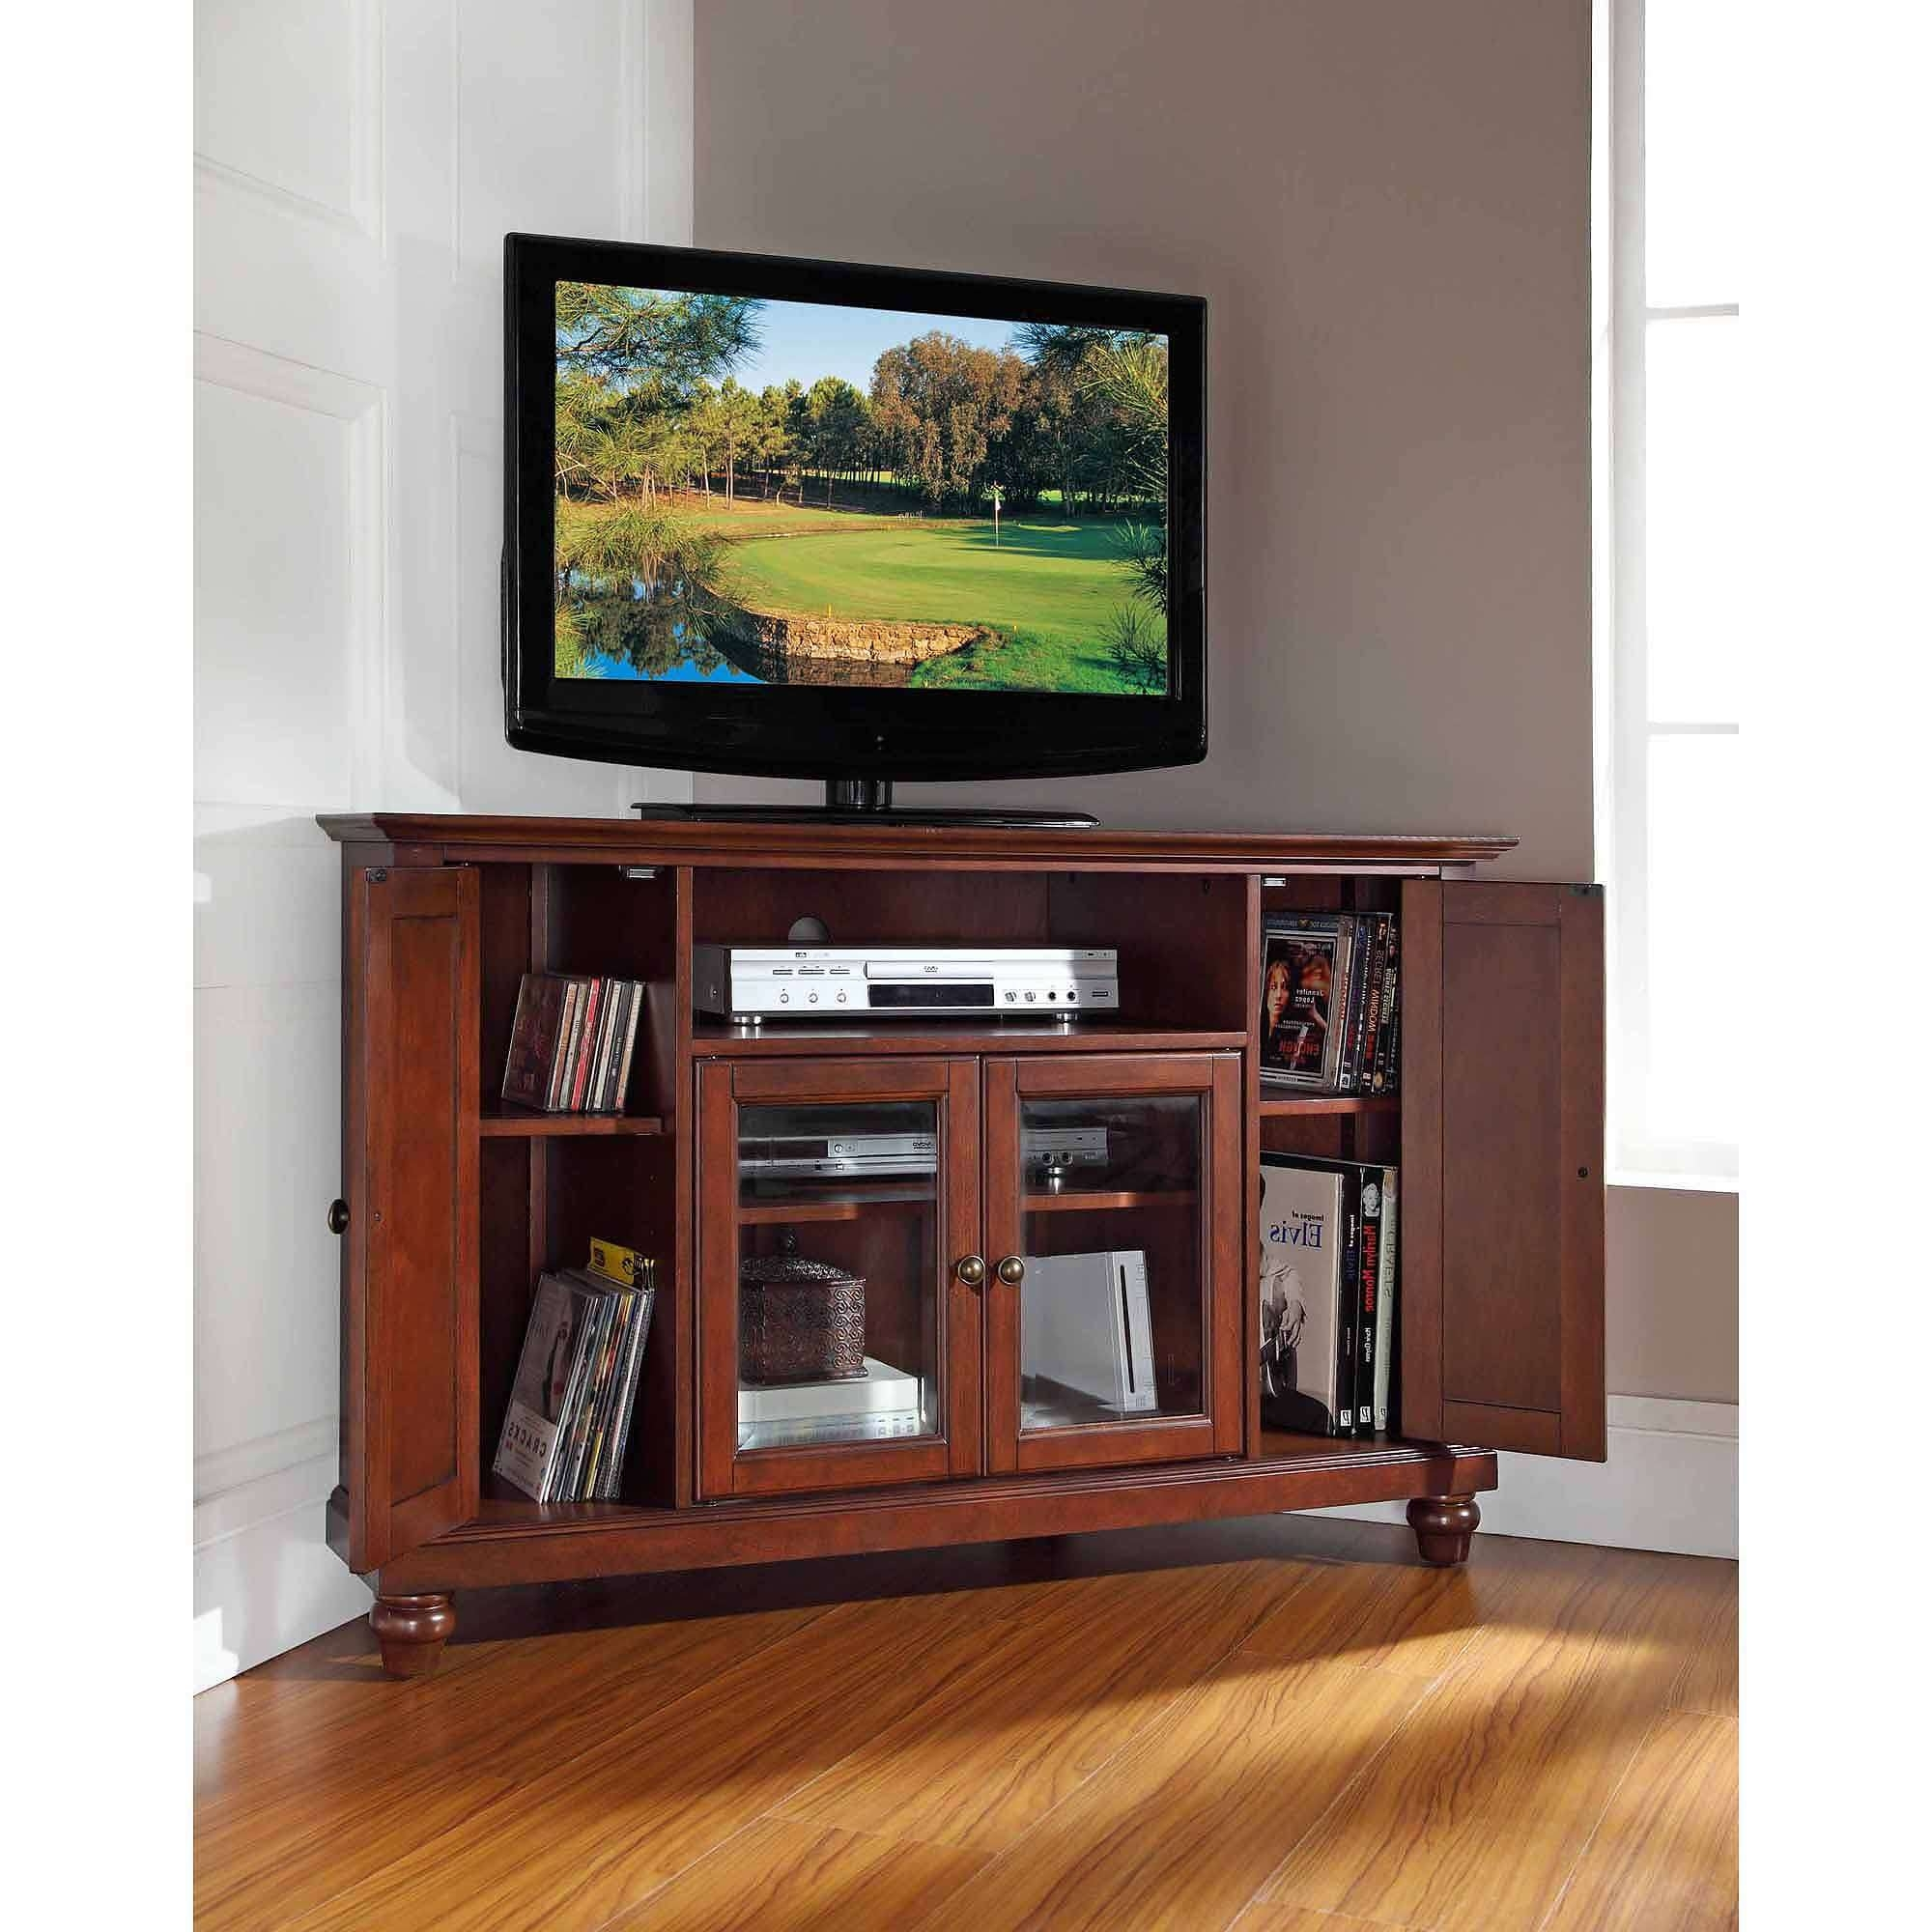 Tv : Fascinate Dark Wood Small Tv Stand Inspirational Dark Cherry Pertaining To Large Corner Tv Stands (View 11 of 15)